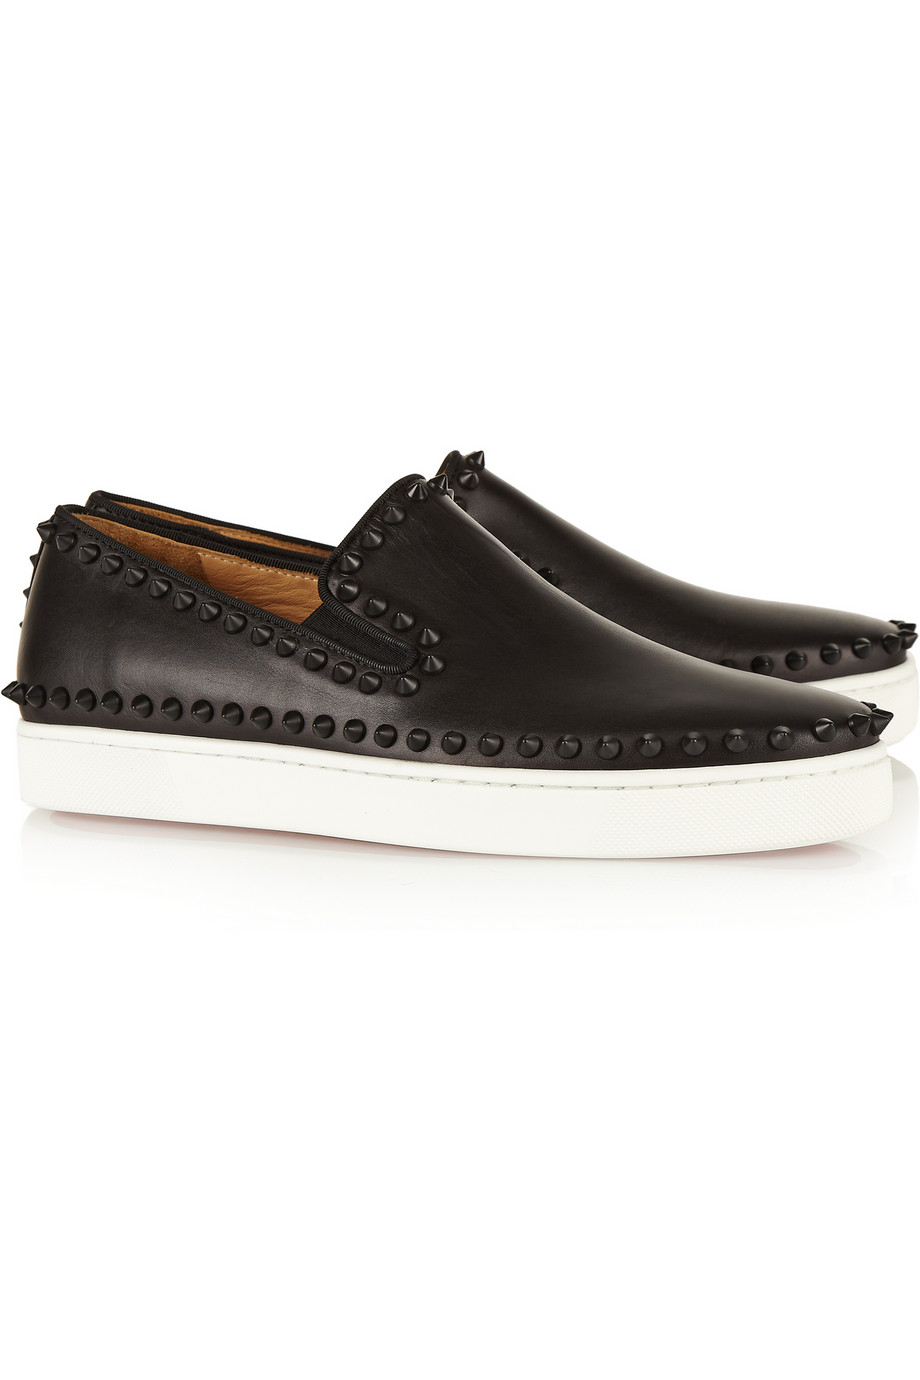 White Studded Louboutin Shoes